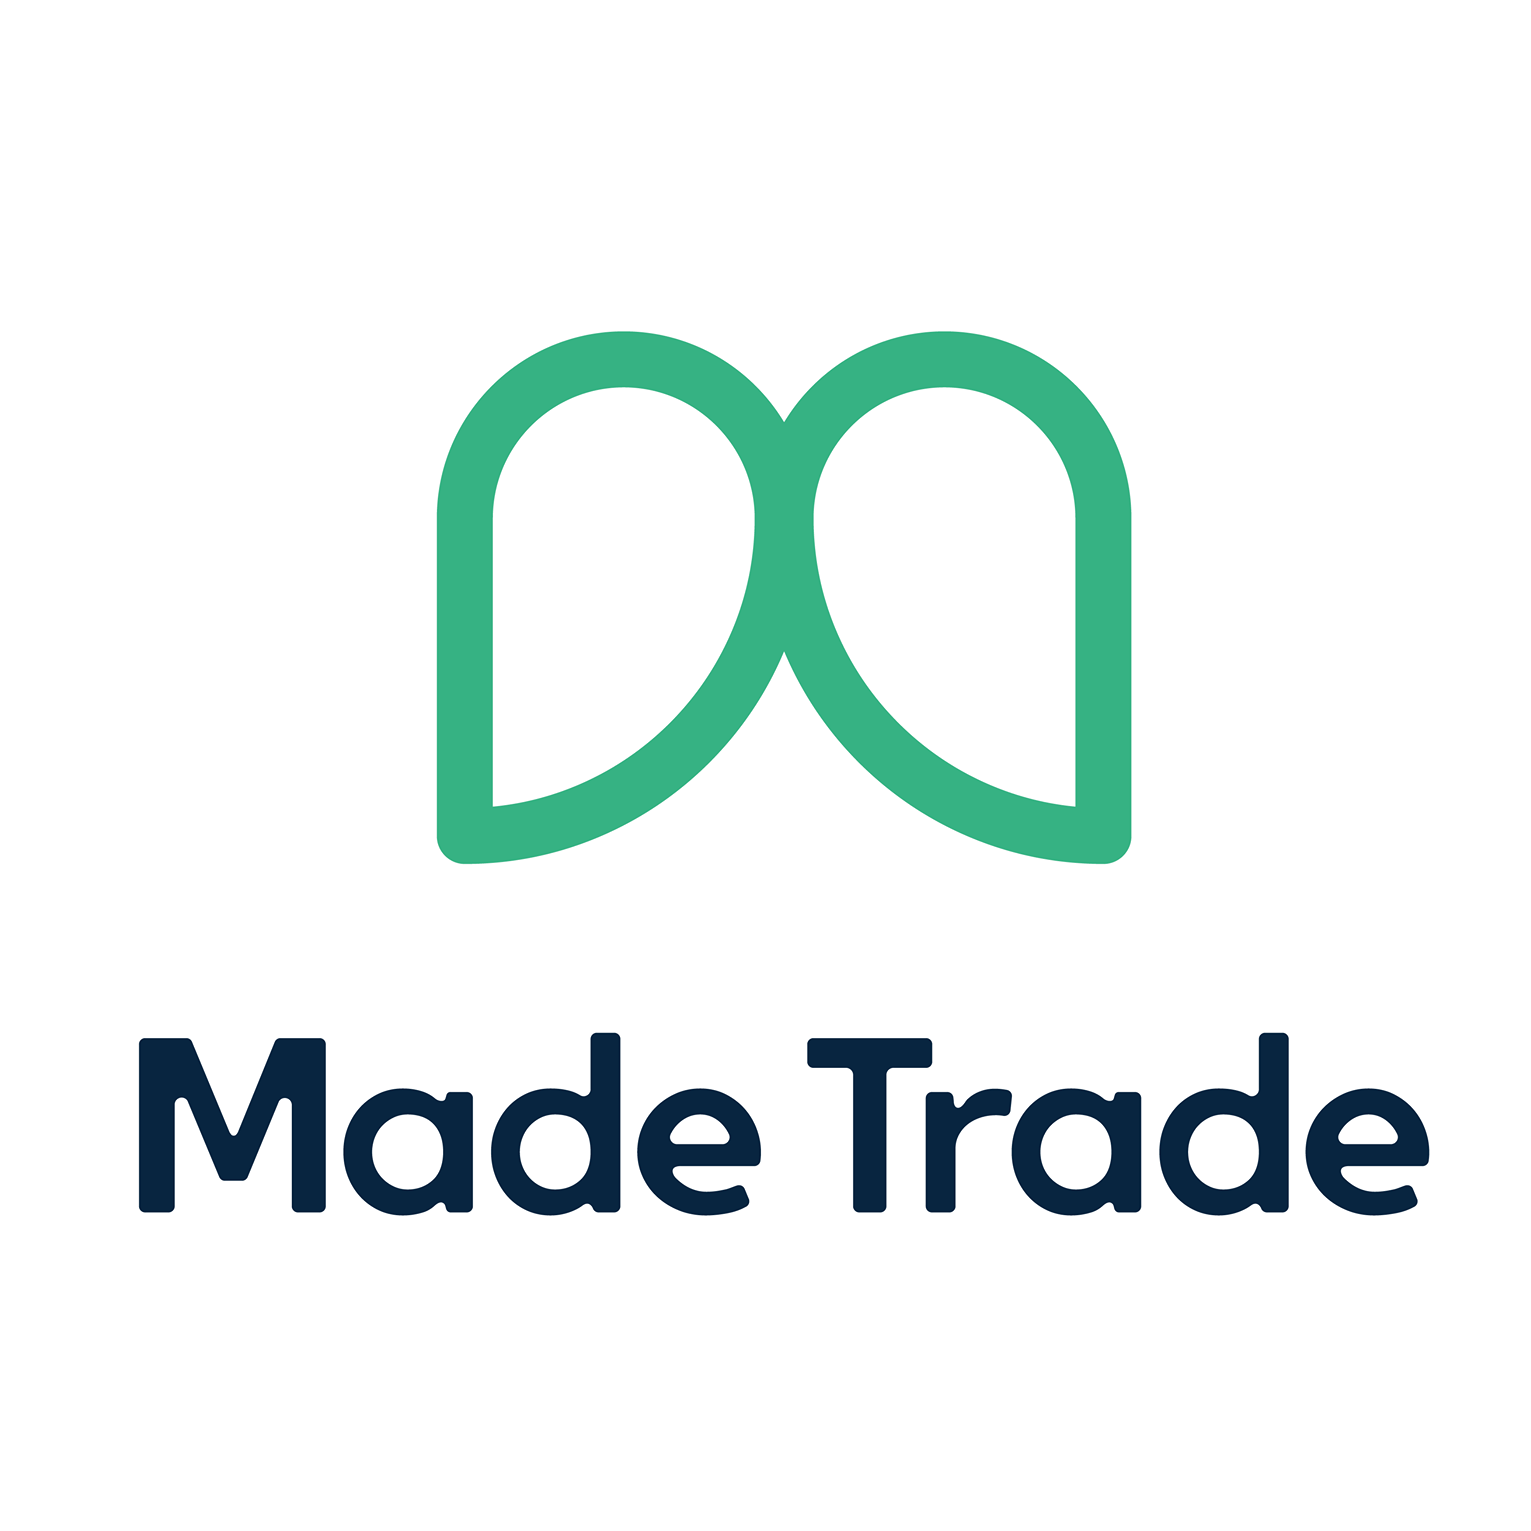 madetrade - 2019 sustainable fashion forum sponsor